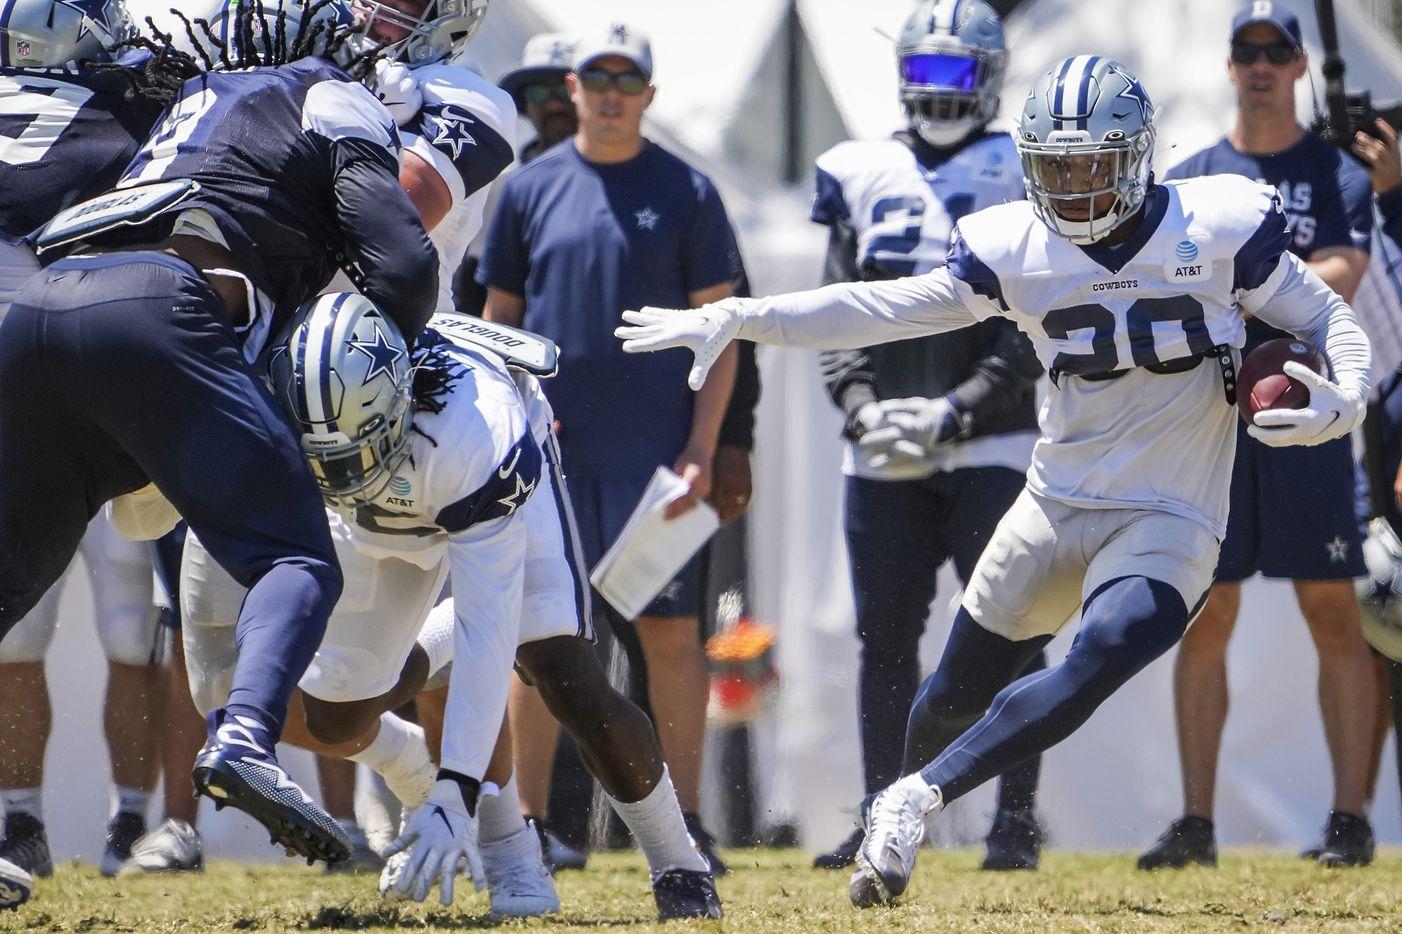 Dallas Cowboys running back Tony Pollard (20) runs the ball during a practice at training camp on Sunday, Aug. 1, 2021, in Oxnard, Calif.